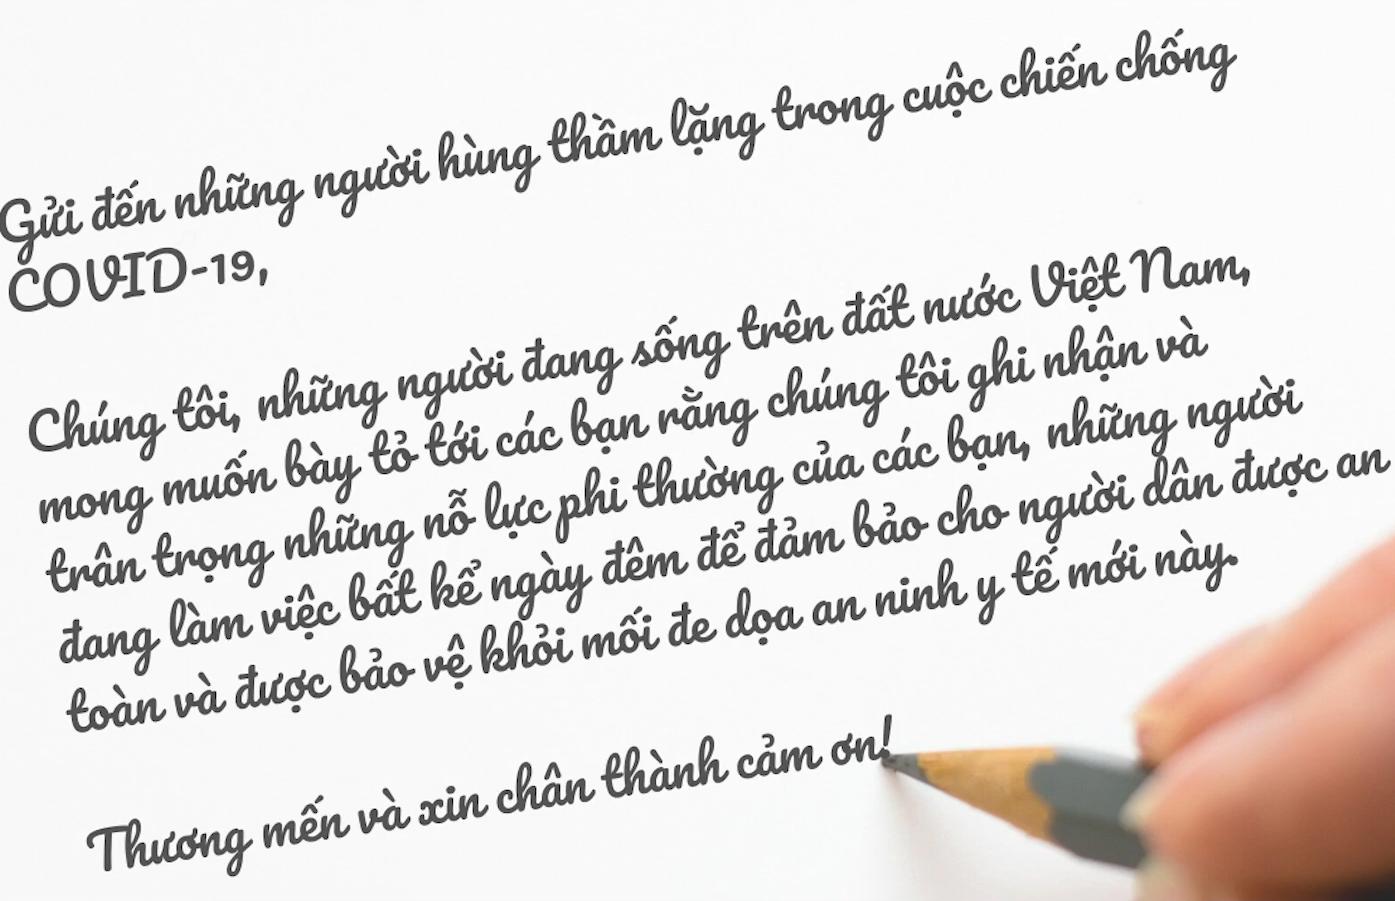 clip who gui loi cam on nhung nguoi tham gia cuoc chien chong covid 19 tai viet nam